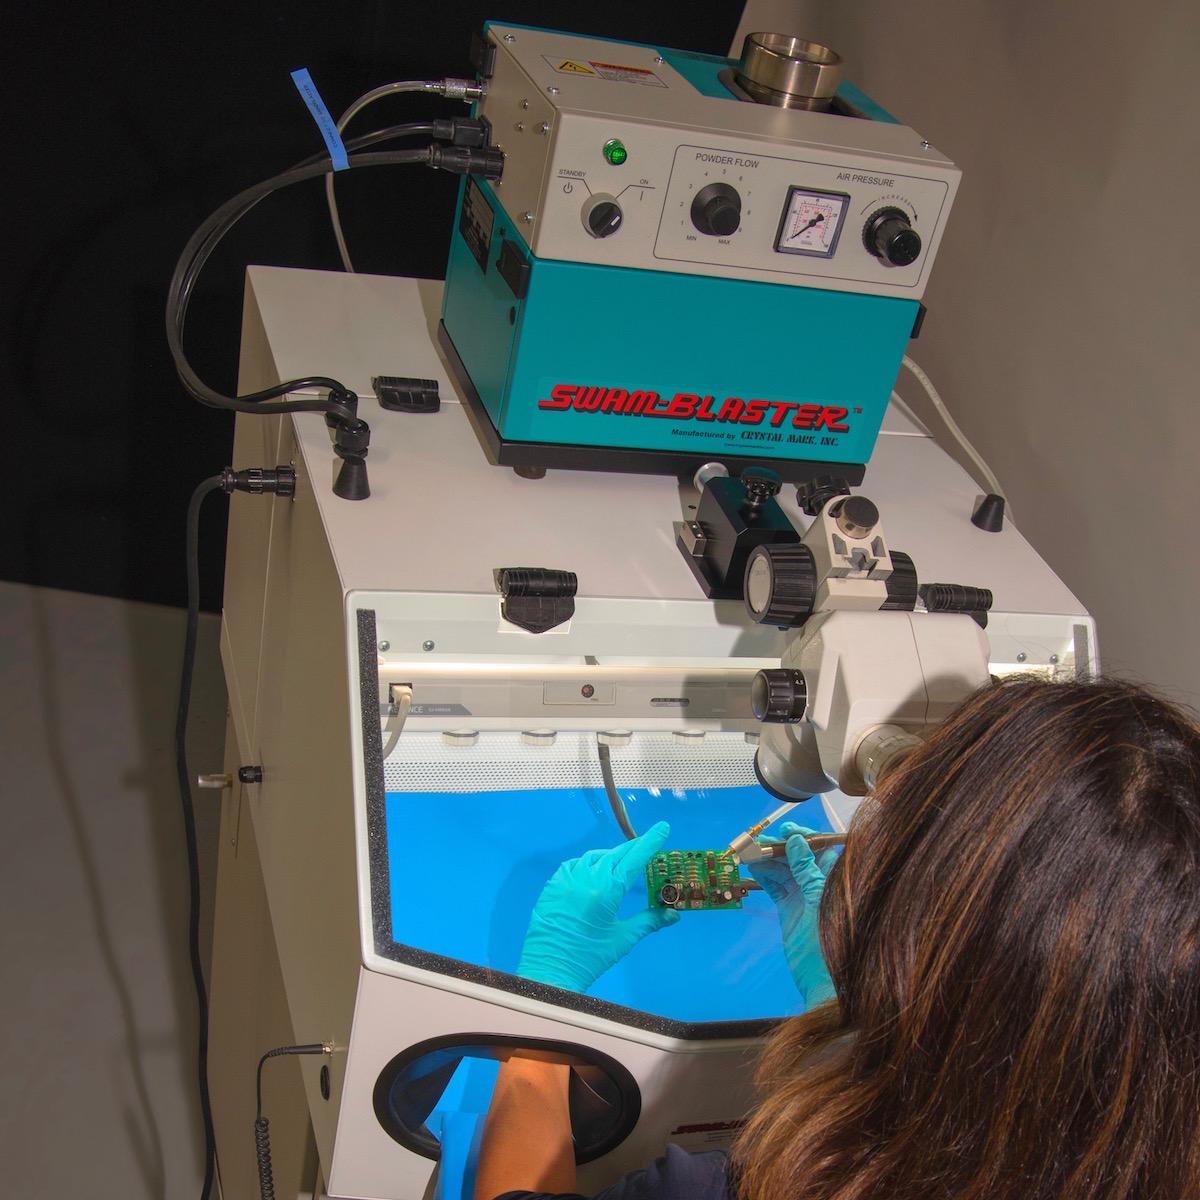 SWAM CCR-CWC-MV2L | Point Ionizer for ESD Control, Microscope, Ergonomic Arm Rests